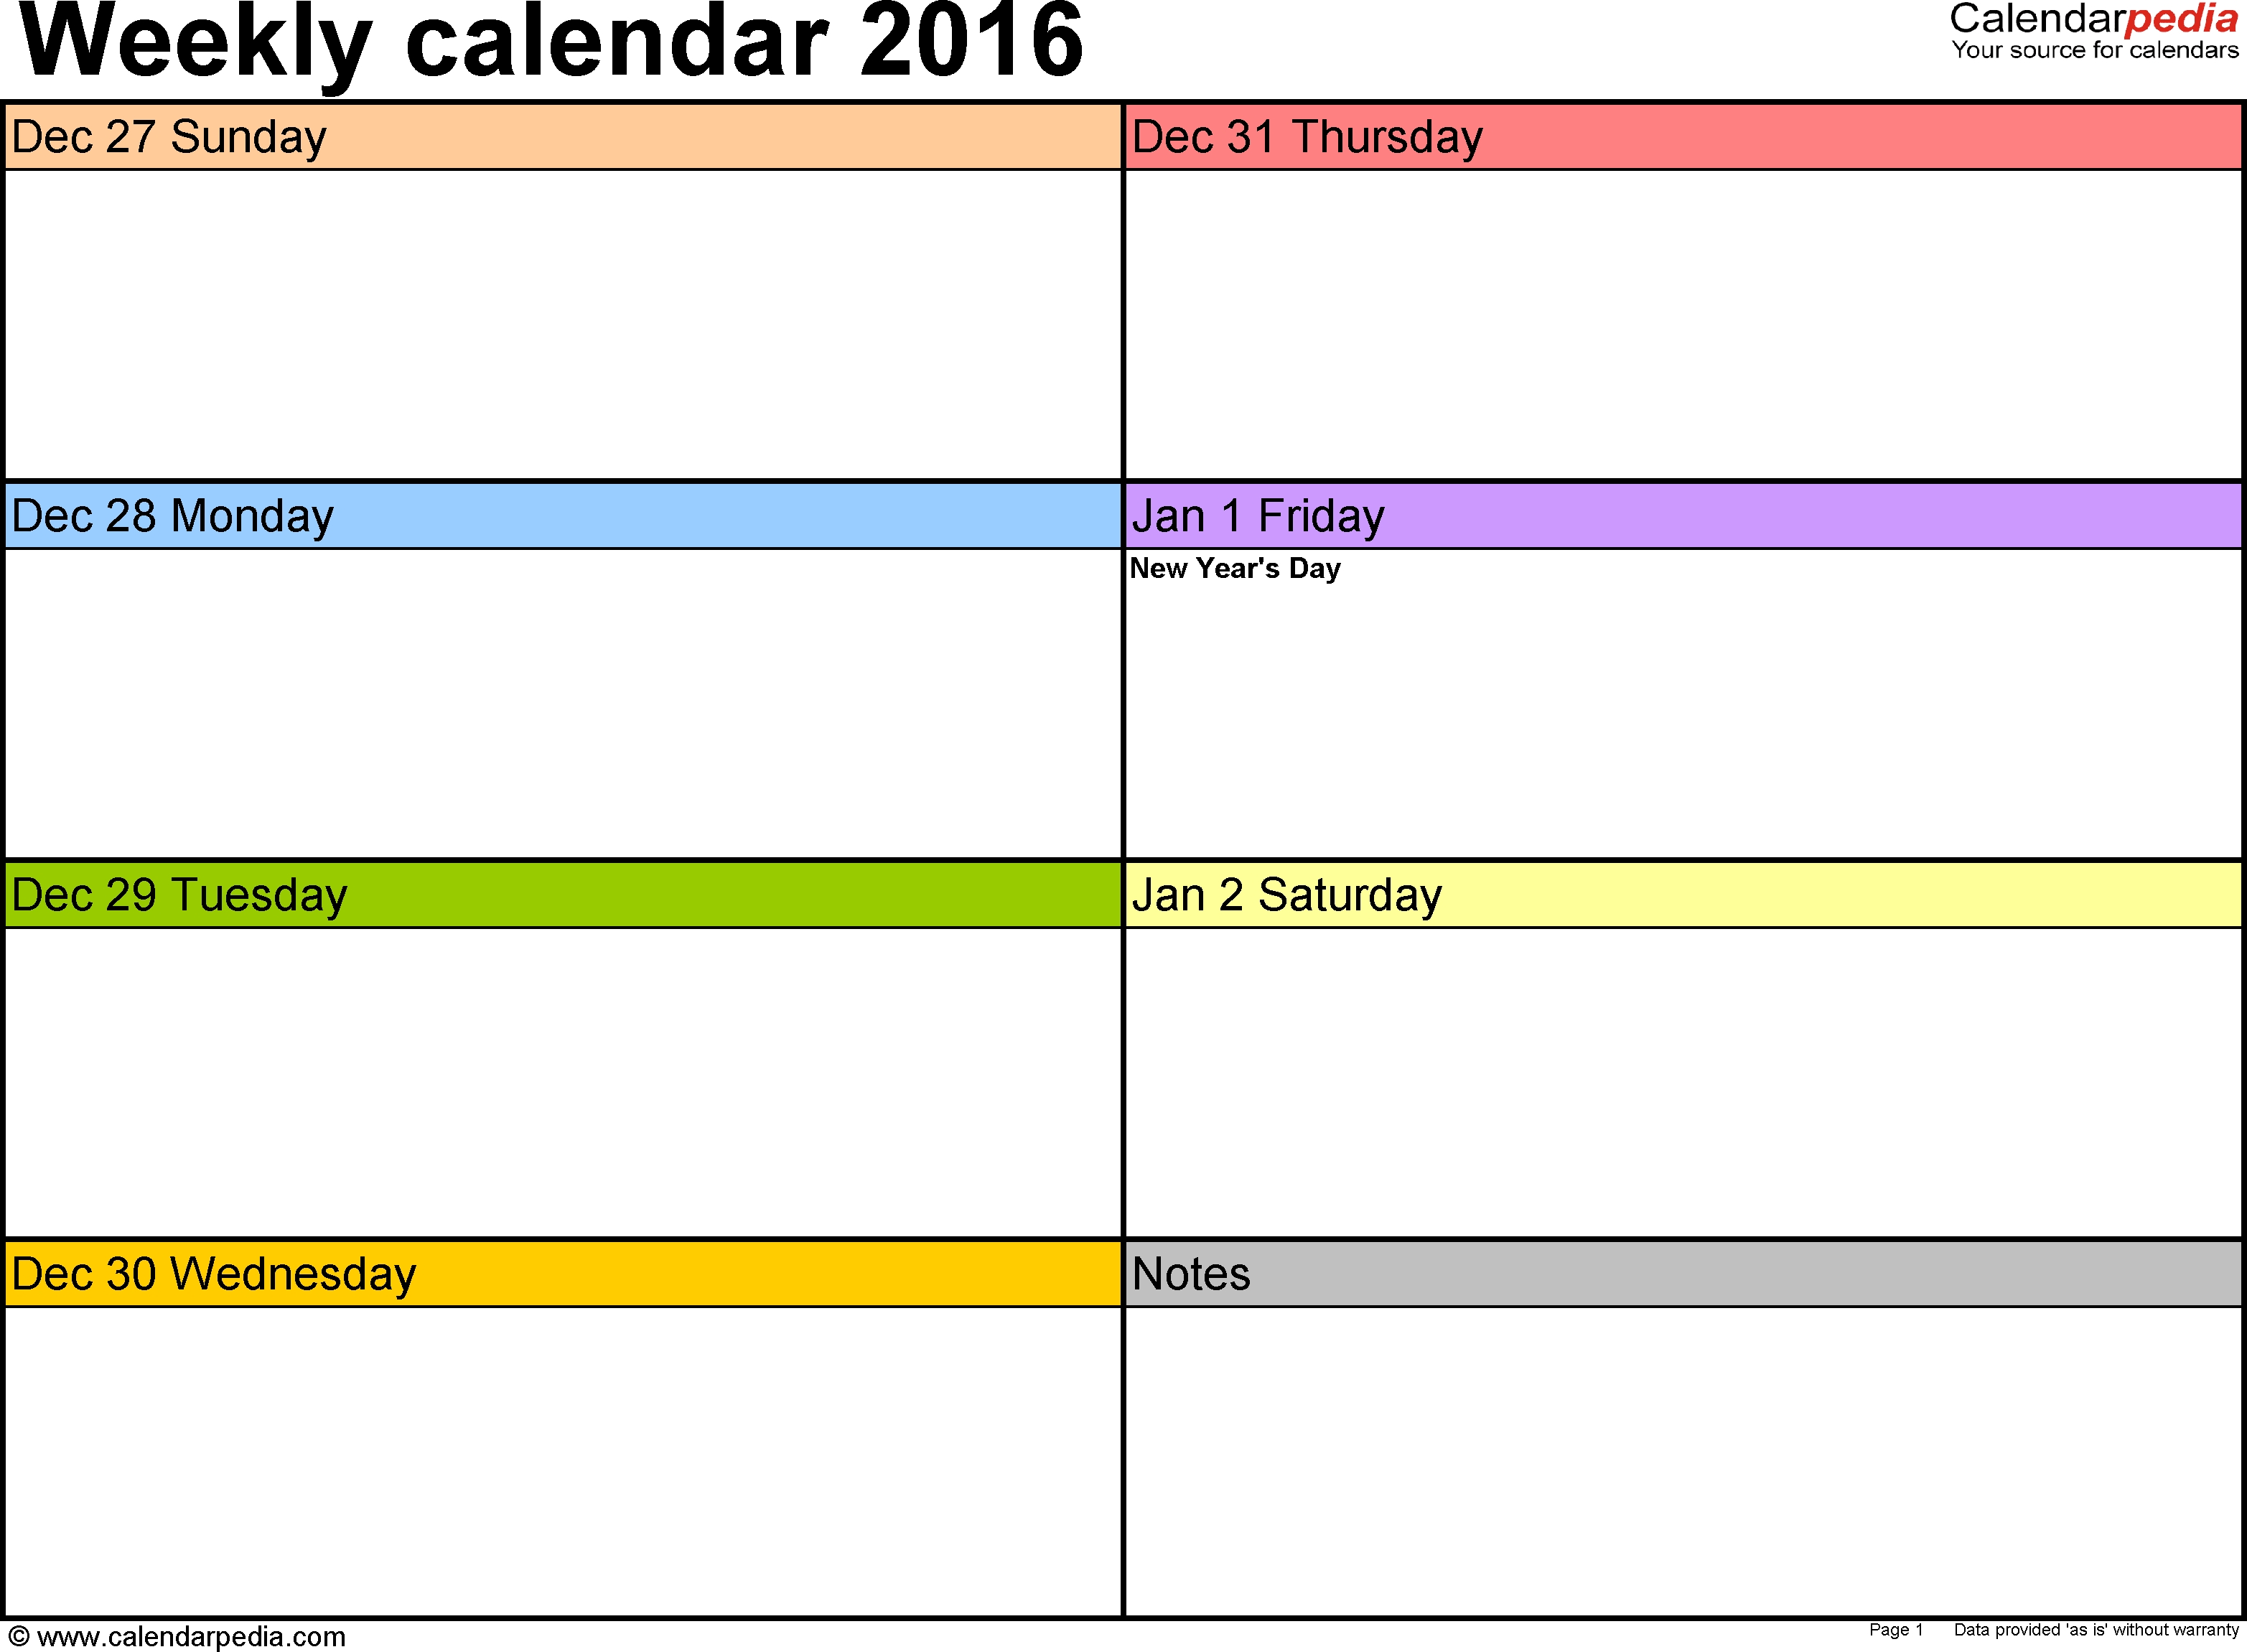 Weekly Calendar 2016 For Excel - 12 Free Printable Templates-Template Printable Calendar 5 Weeks